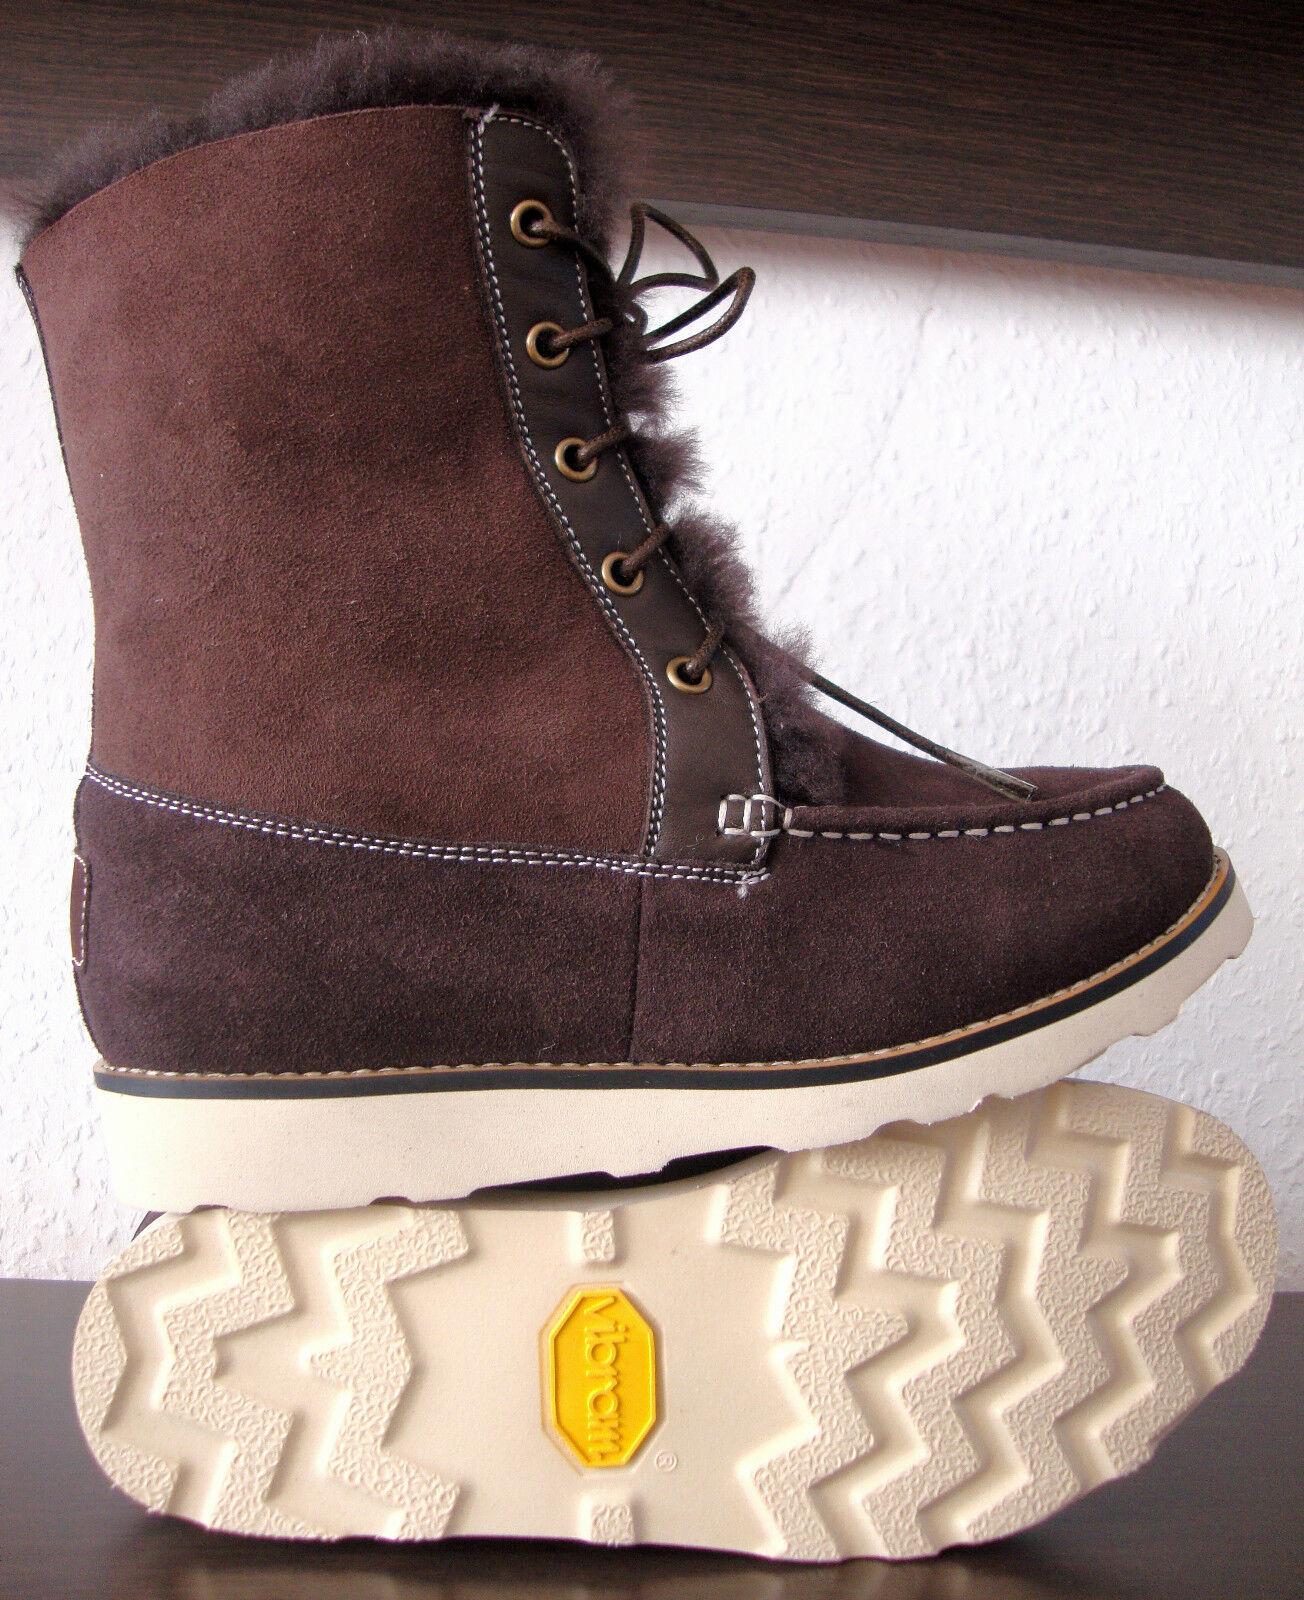 Wo Australia Chukka Boots Luxe Chaussures Rp74ro Bottes Femmes QBhrosdtCx